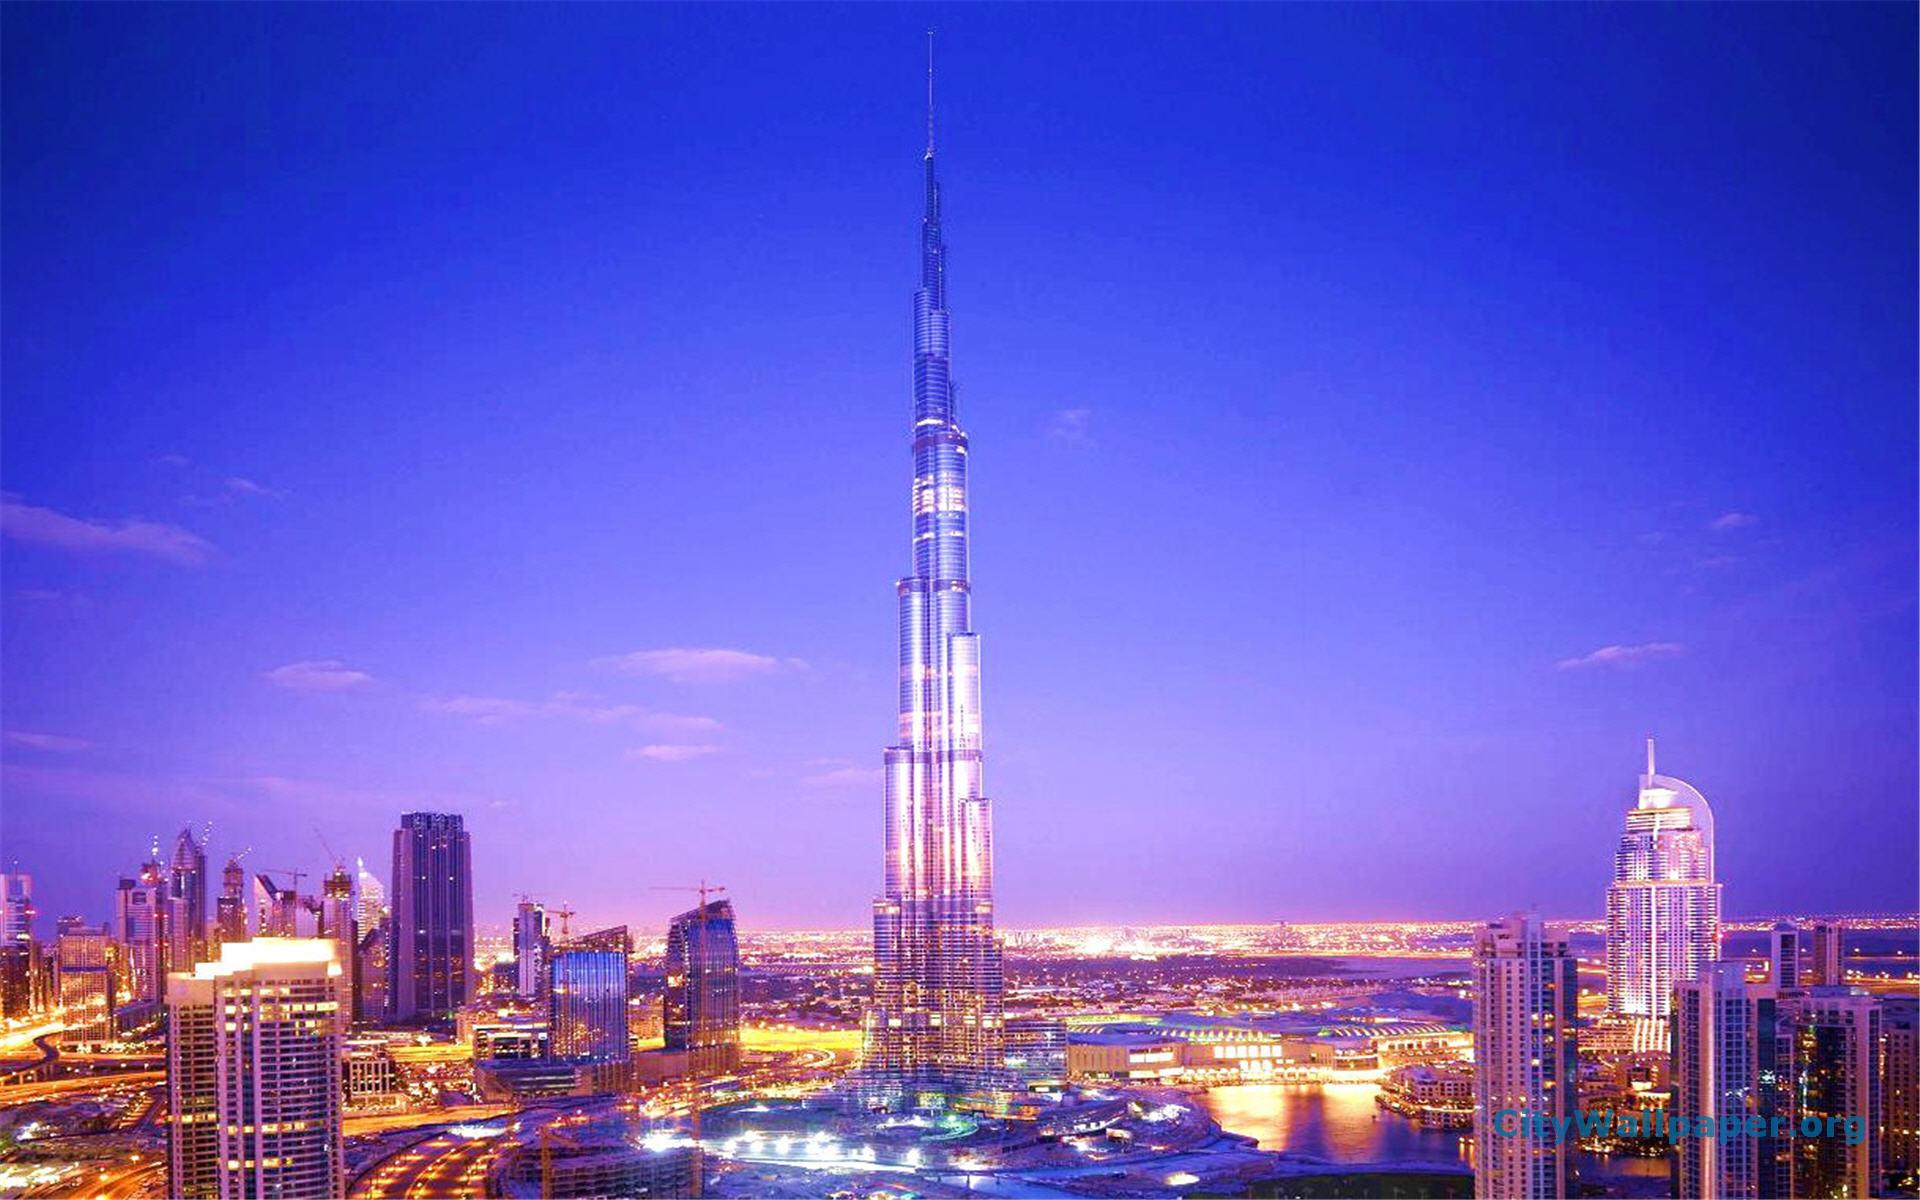 Burj khalifa wallpapers images photos pictures backgrounds for Best at dubai